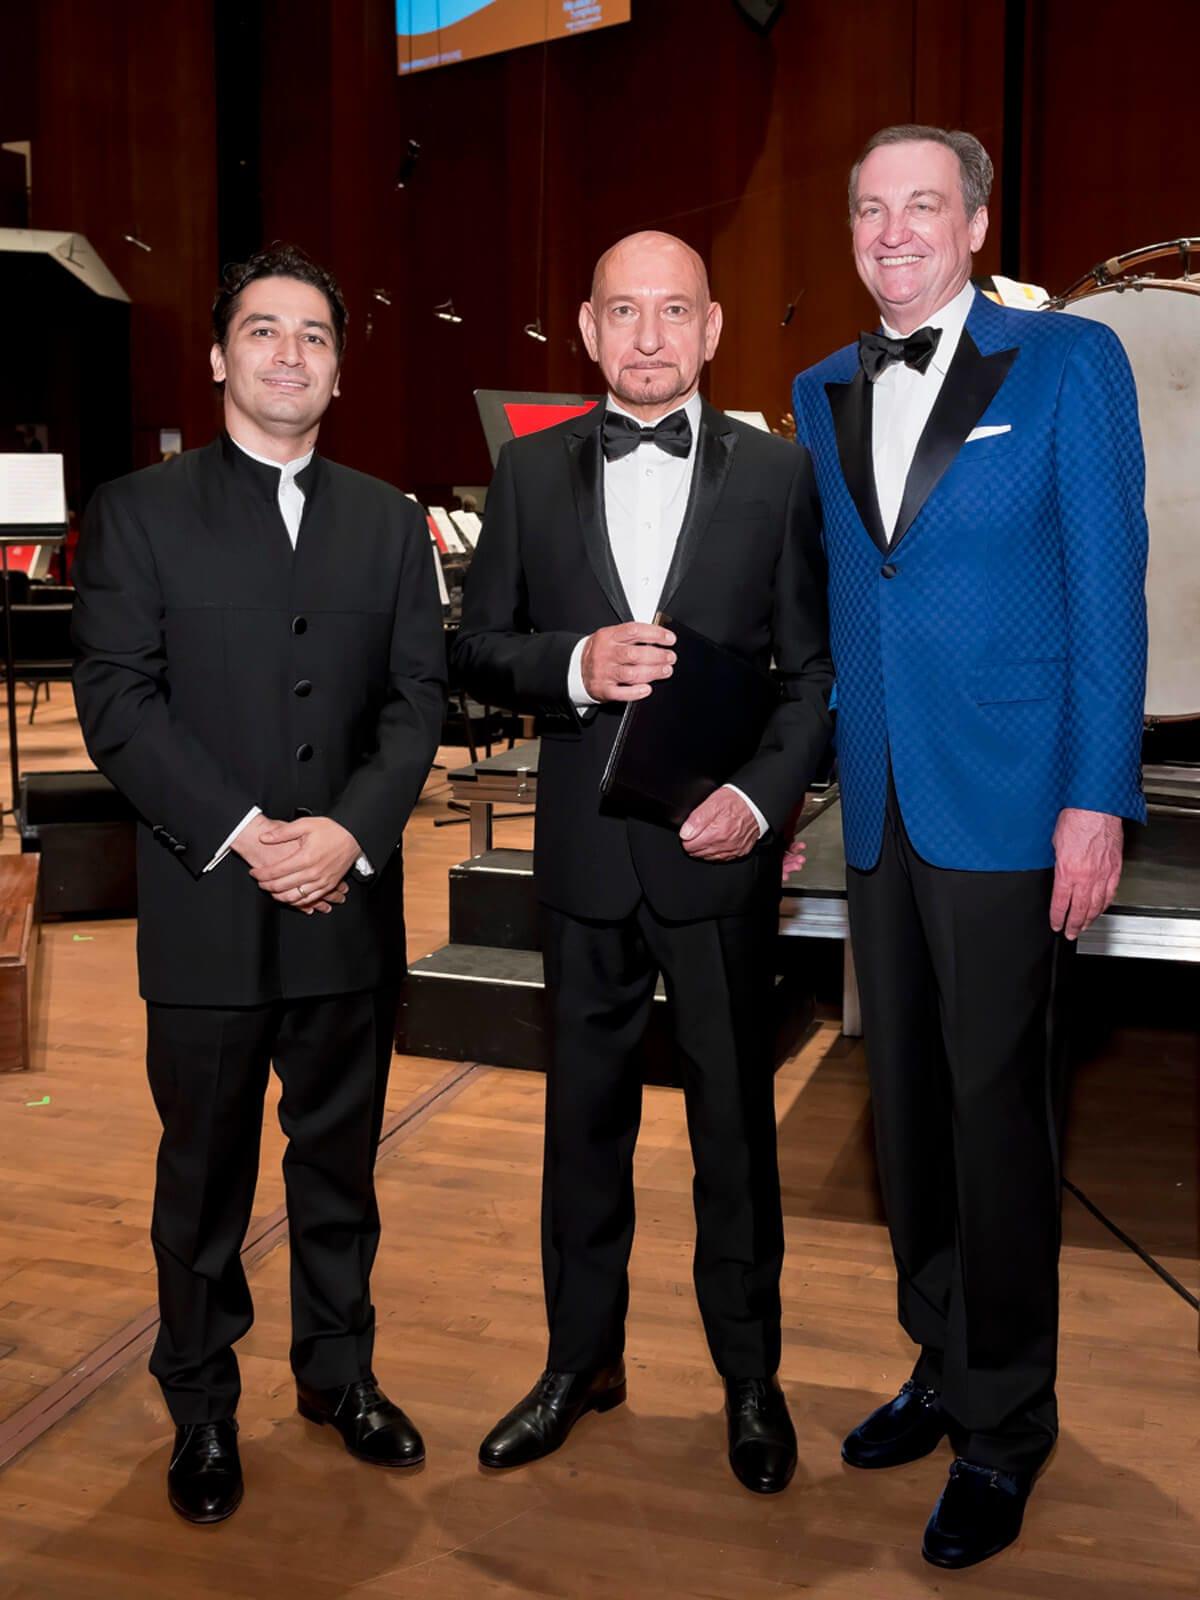 Houston Symphony Opening Night, 9/16, Andres Orozco-Estrada, Sir Ben Kingsley, Ralph Burch